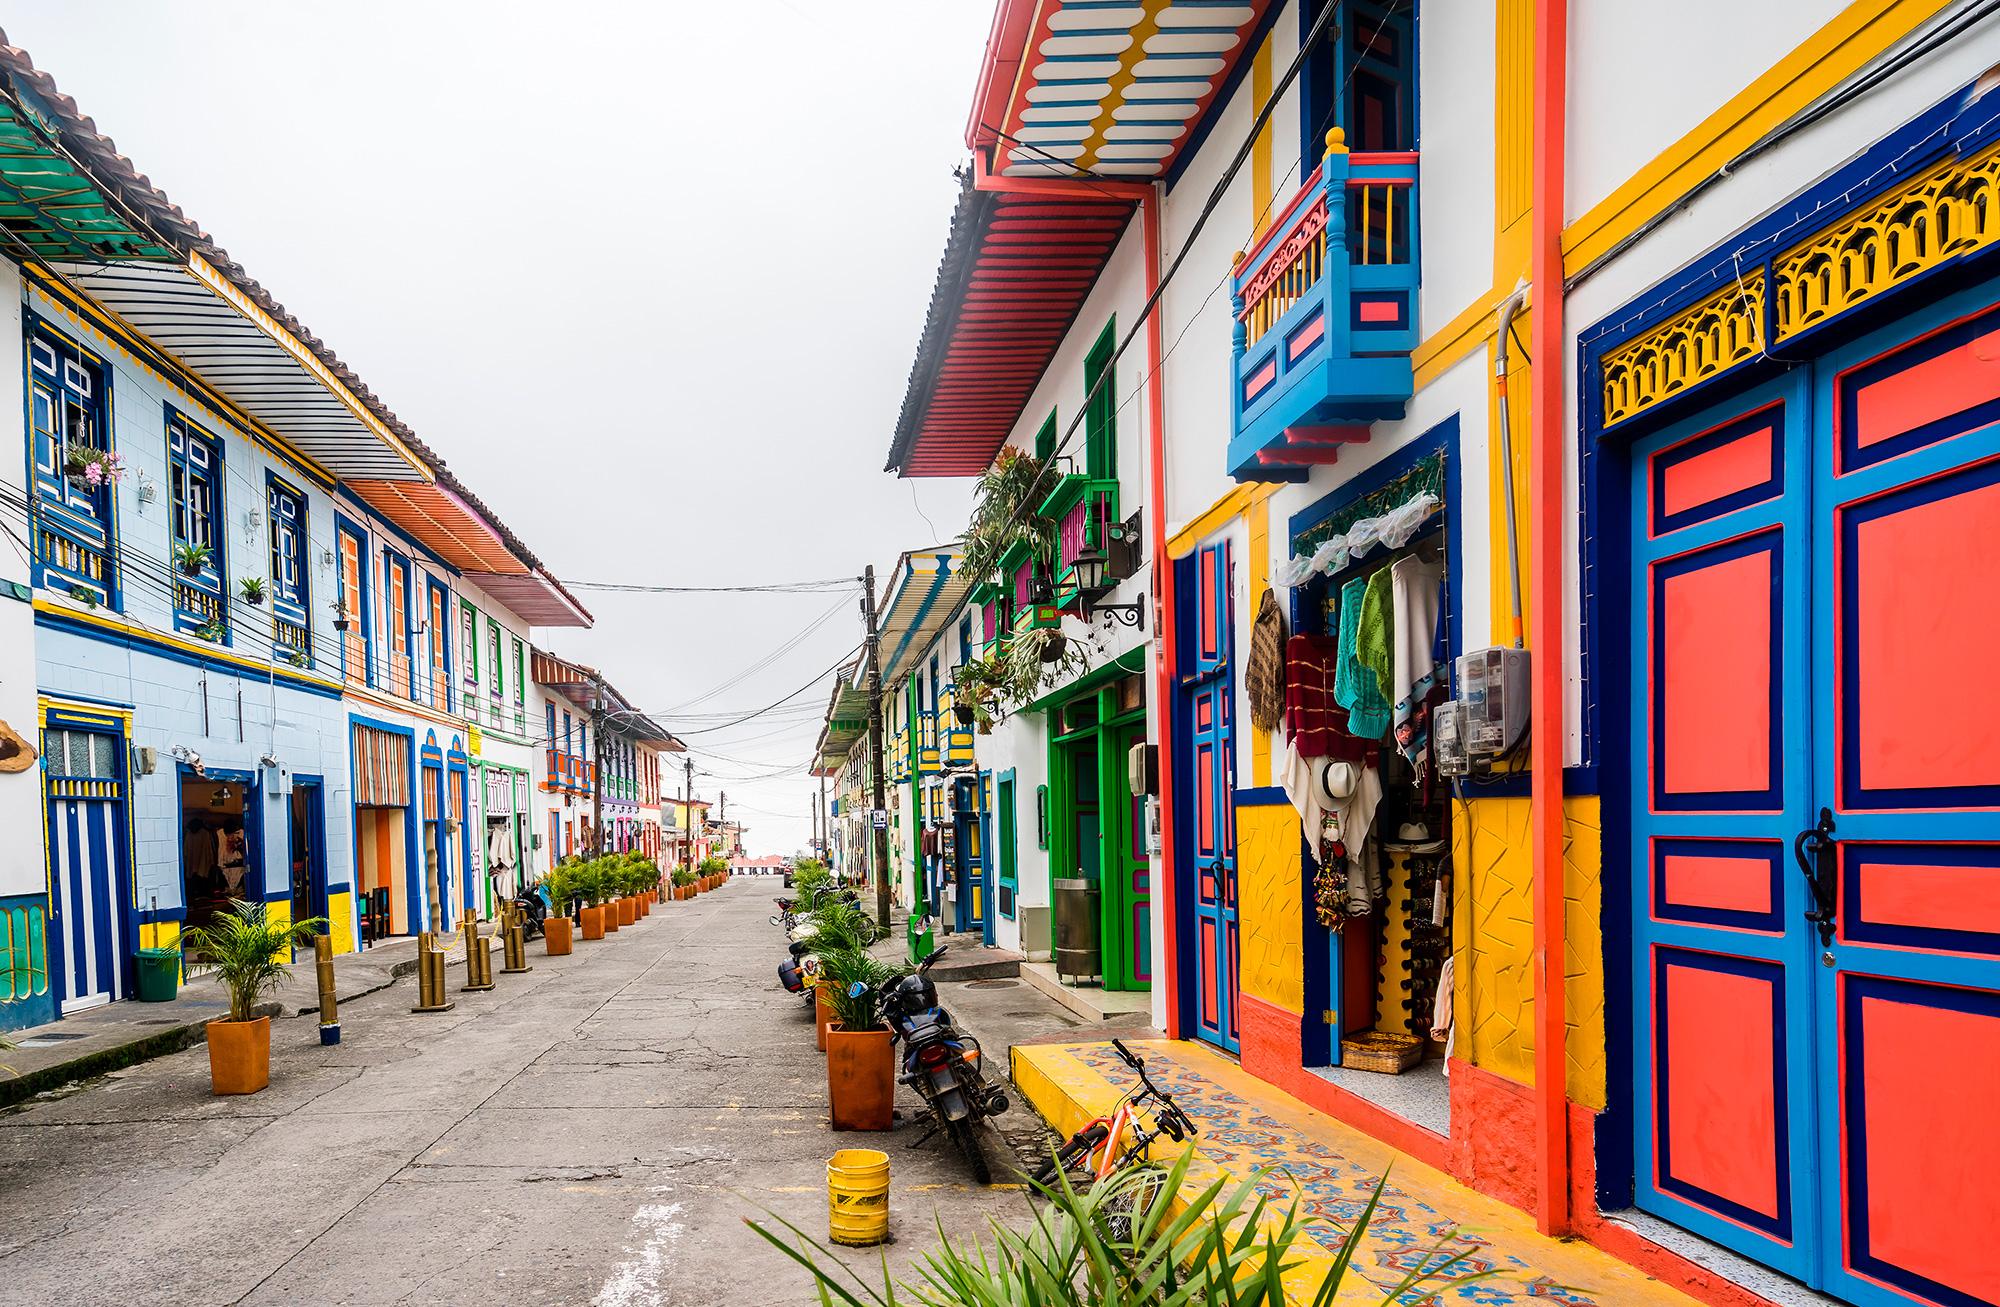 Viaje en Grupo a Colombia - Colombia- imagen #4